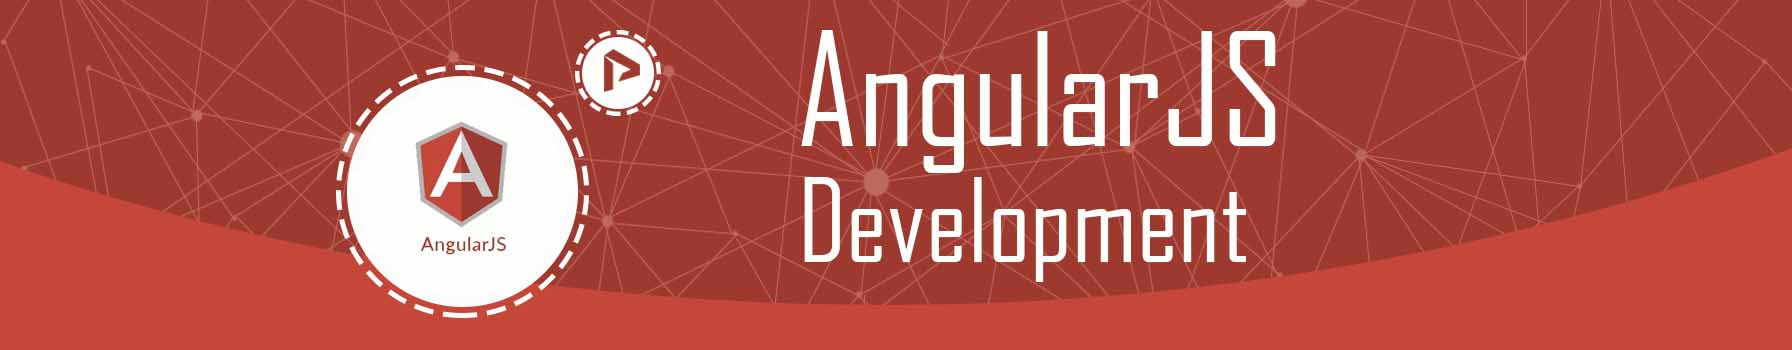 angularjs-development.jpg